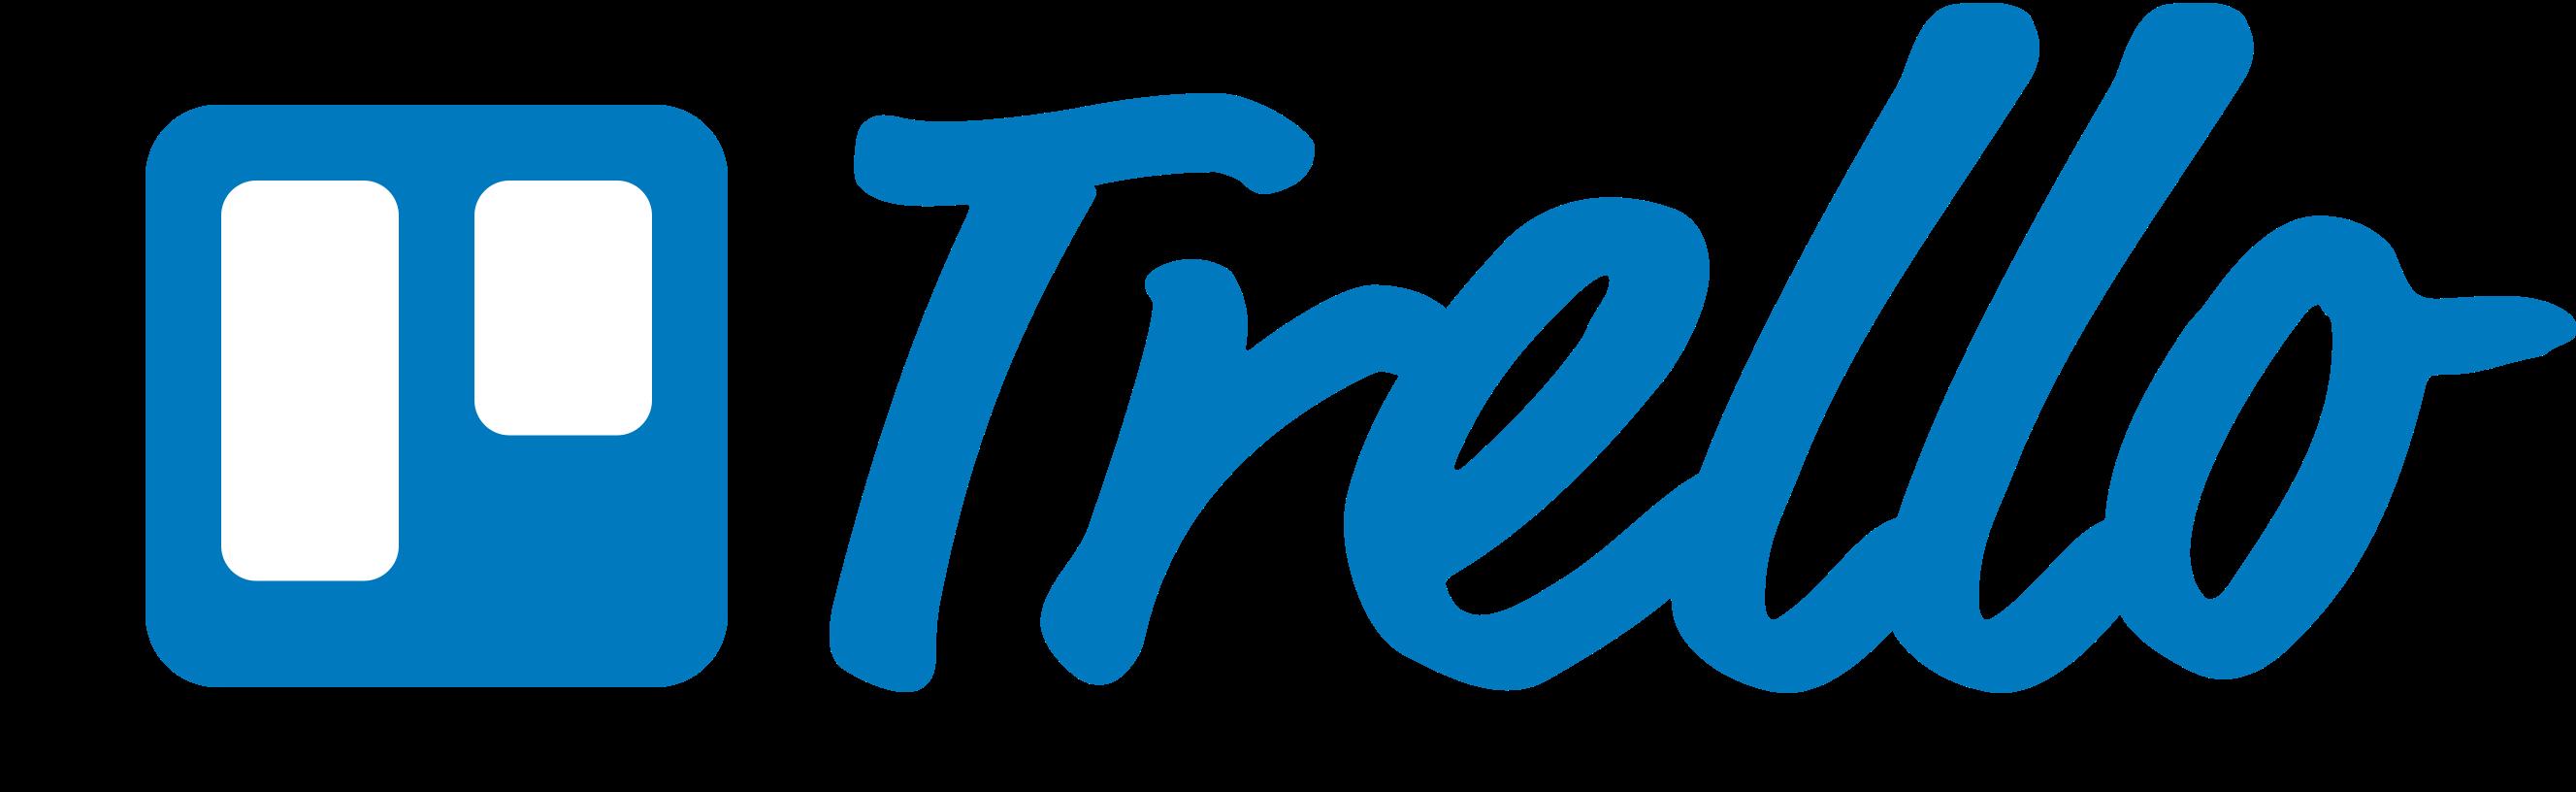 Trello - tool for remote teams